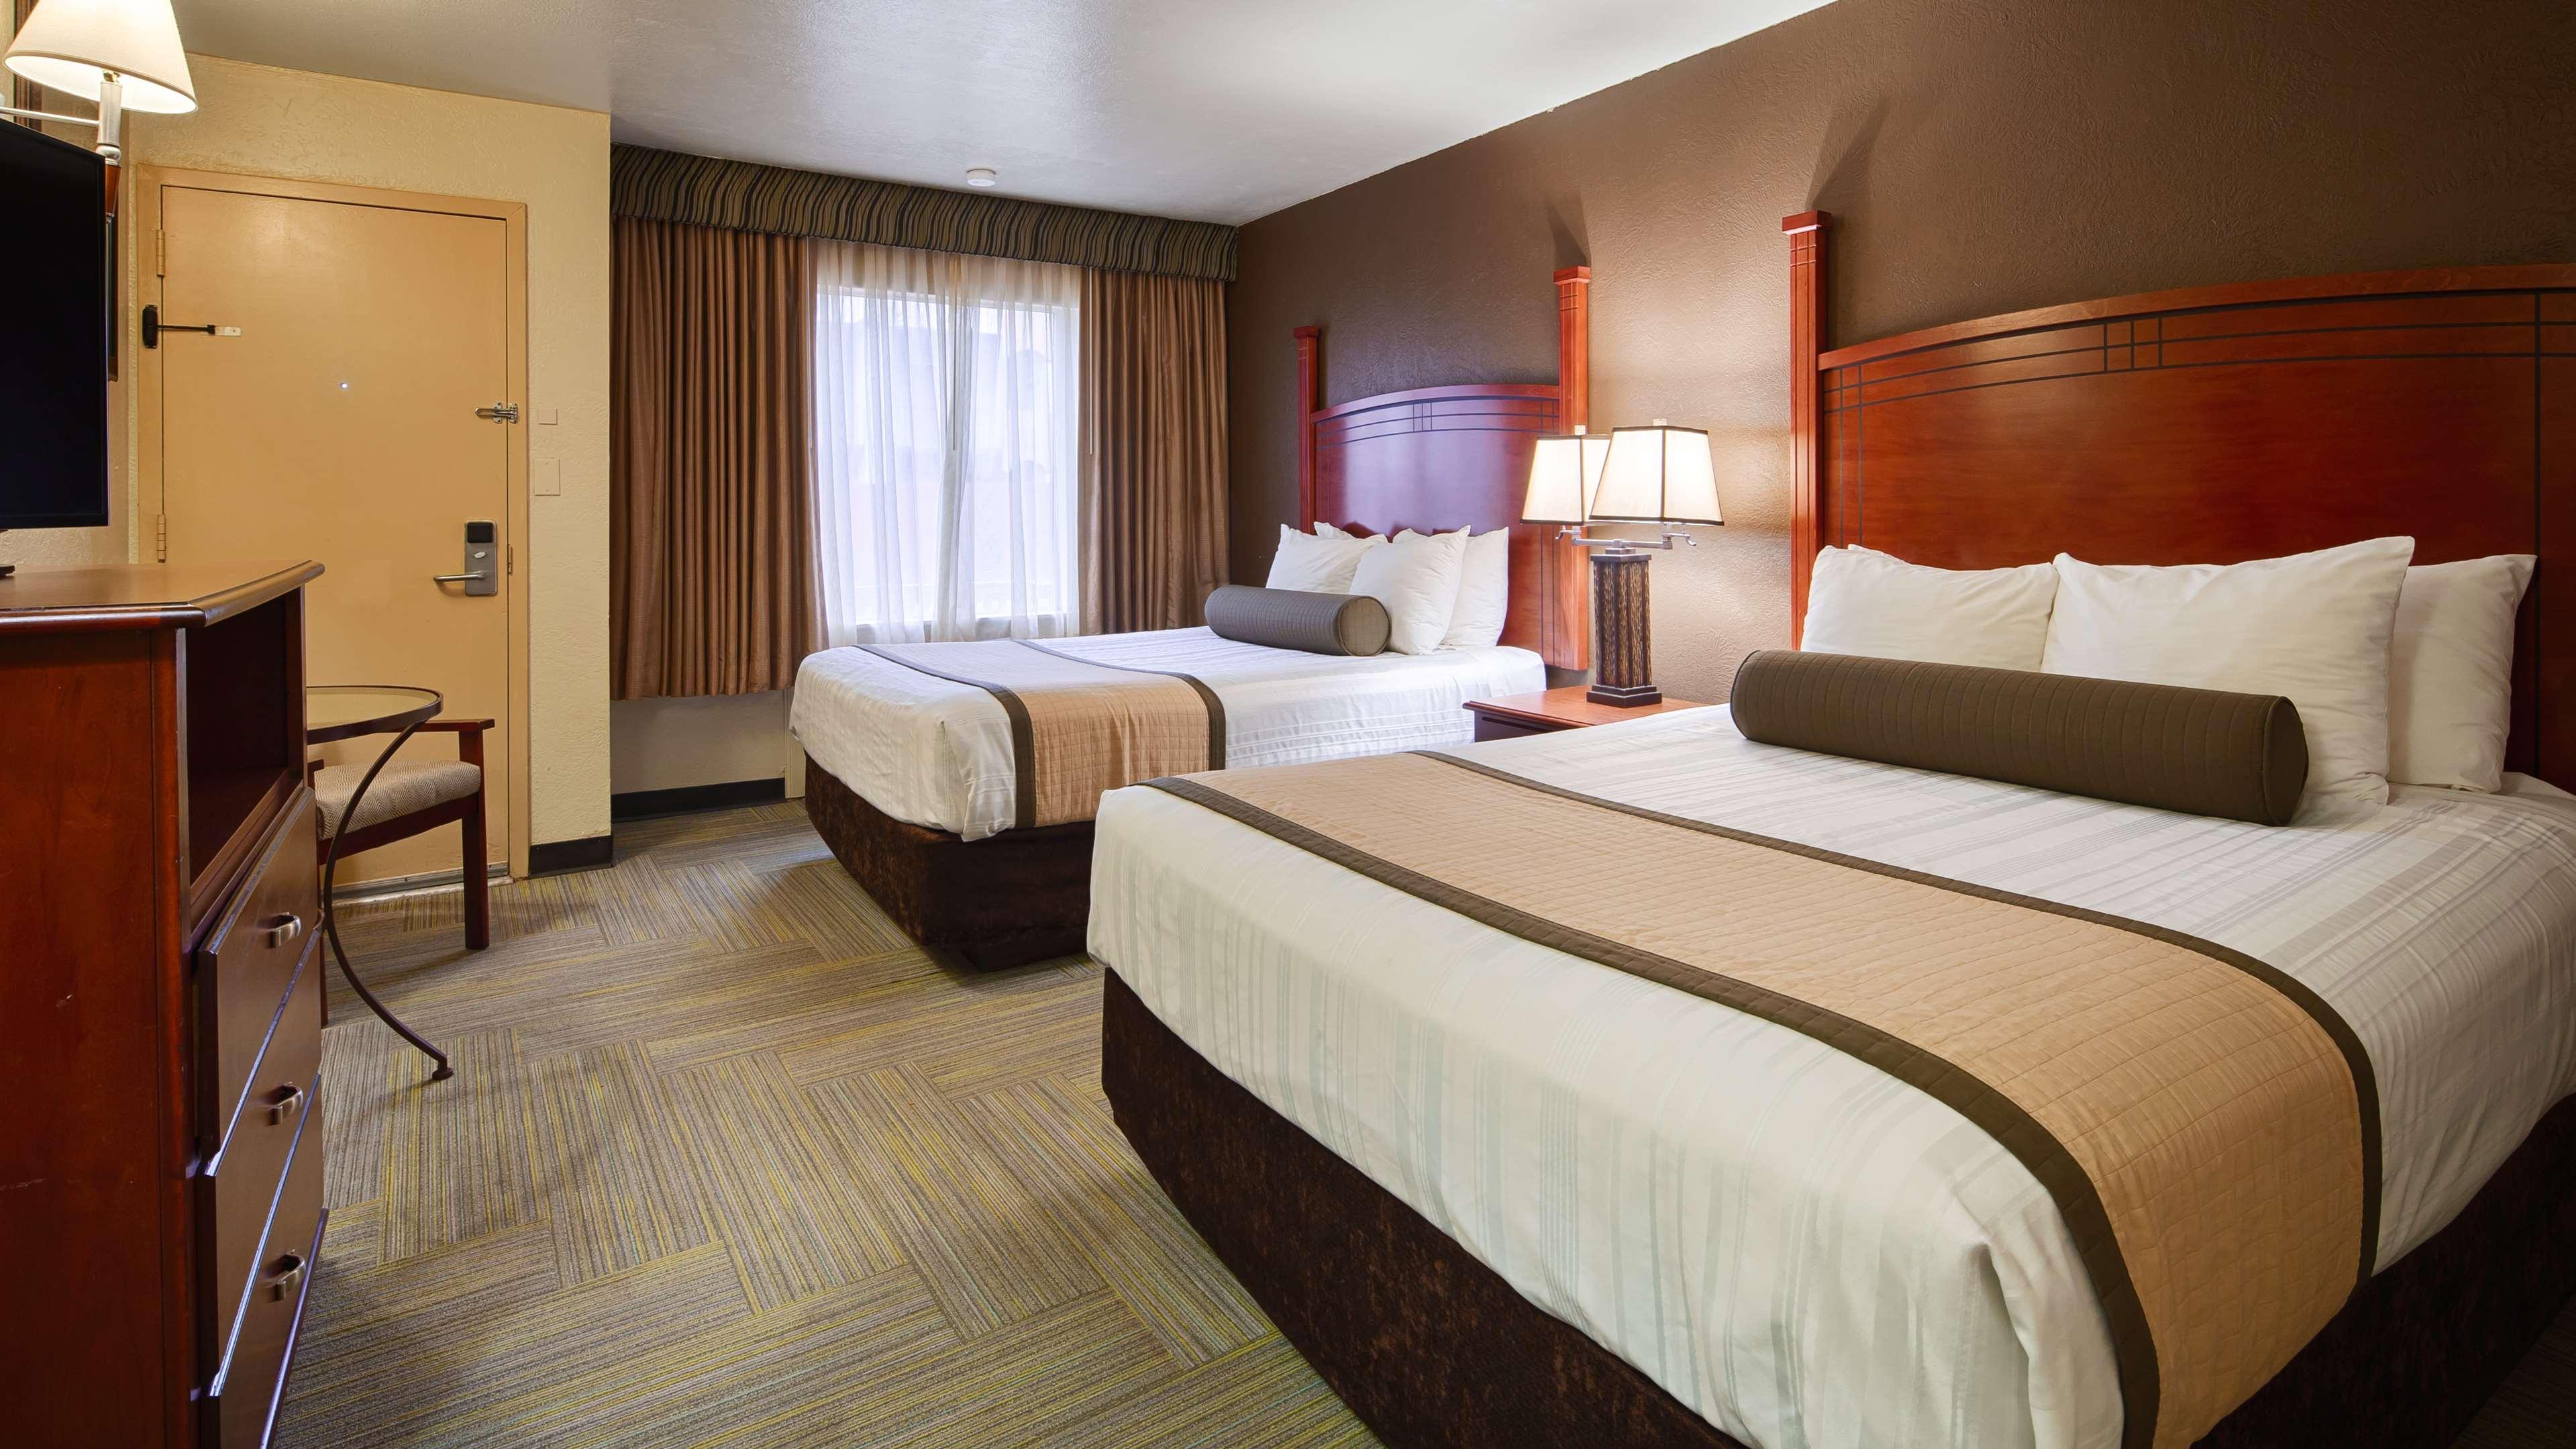 Best Western Plus Lawton Hotel & Convention Center image 13